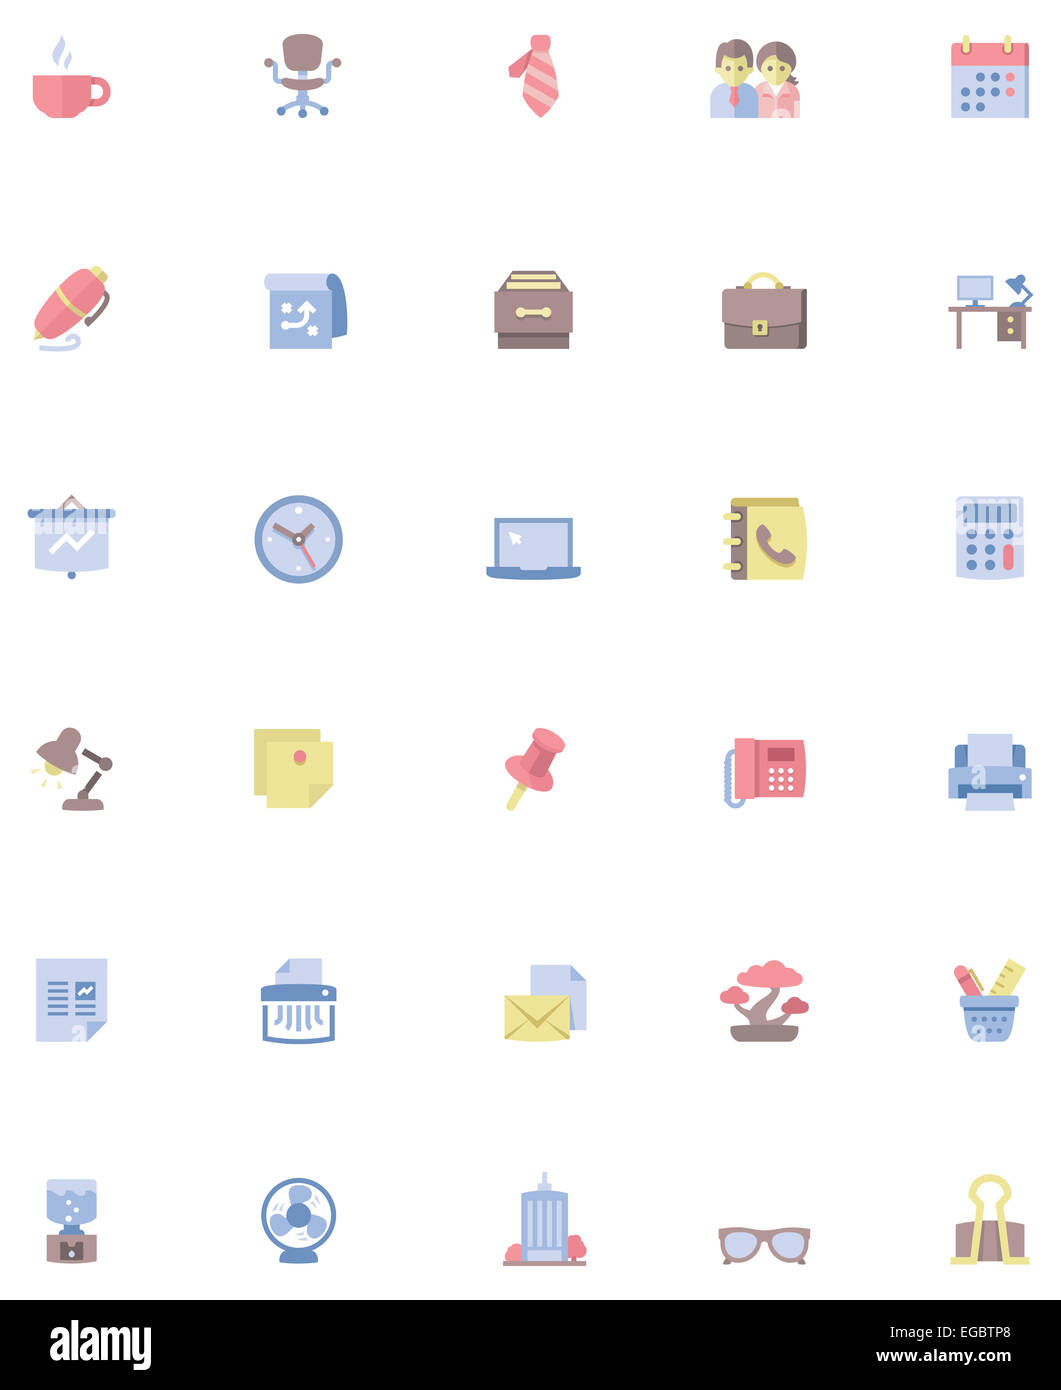 Vektor Buro Icon Set Stockfoto Bild 78936880 Alamy